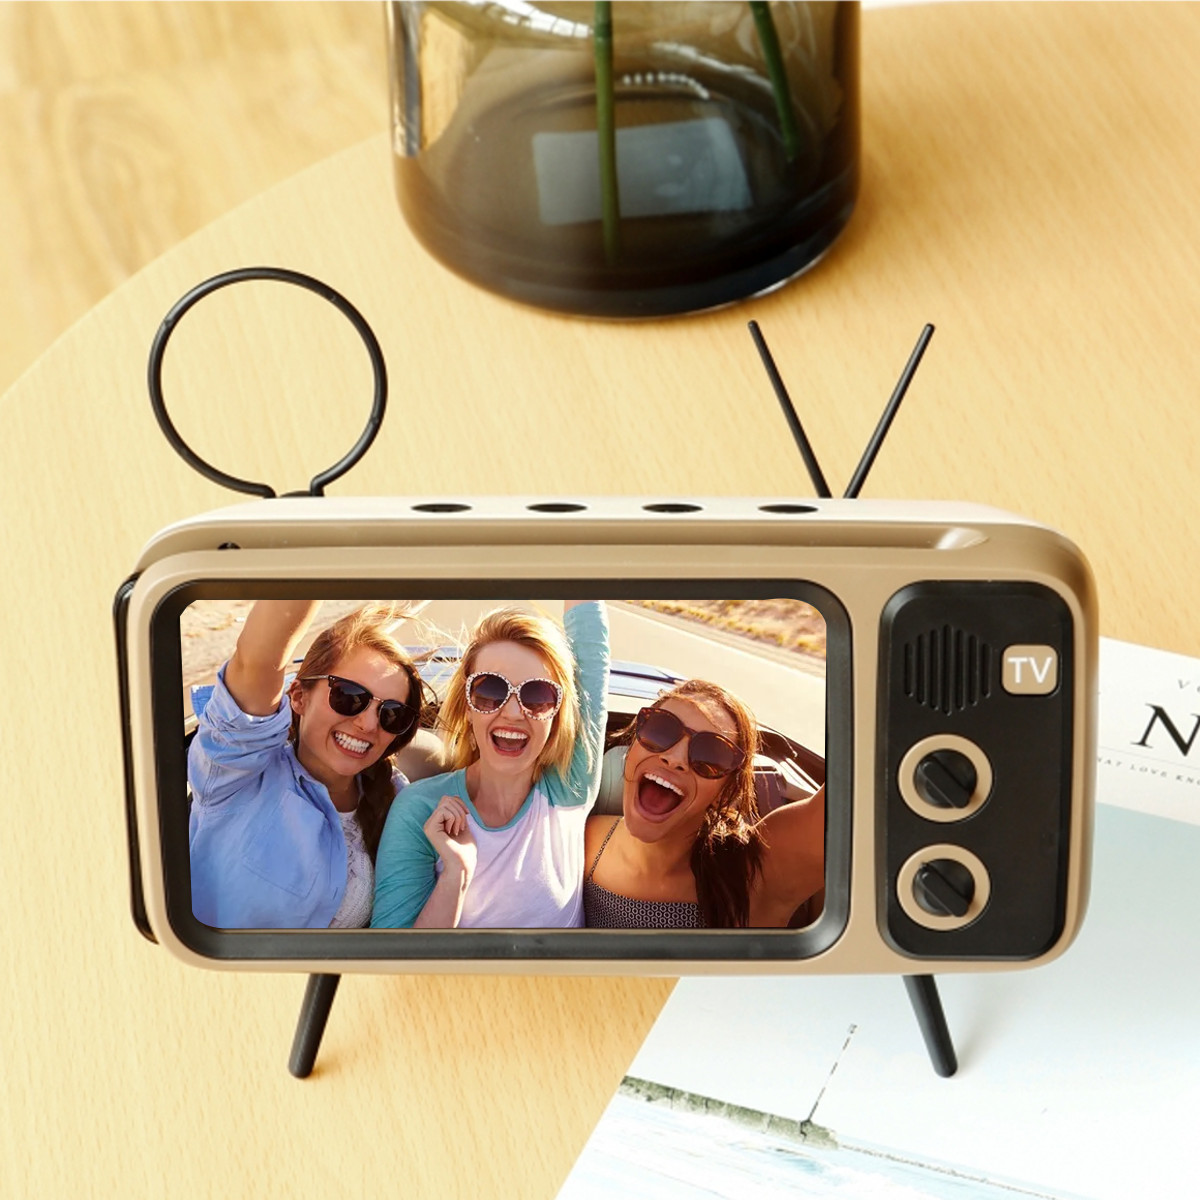 Stereo Bracket Movies Mobile Phone Bluetooth Speaker TV Music Player Retro Pocket Home Audio Electric Portable Mini Wireless